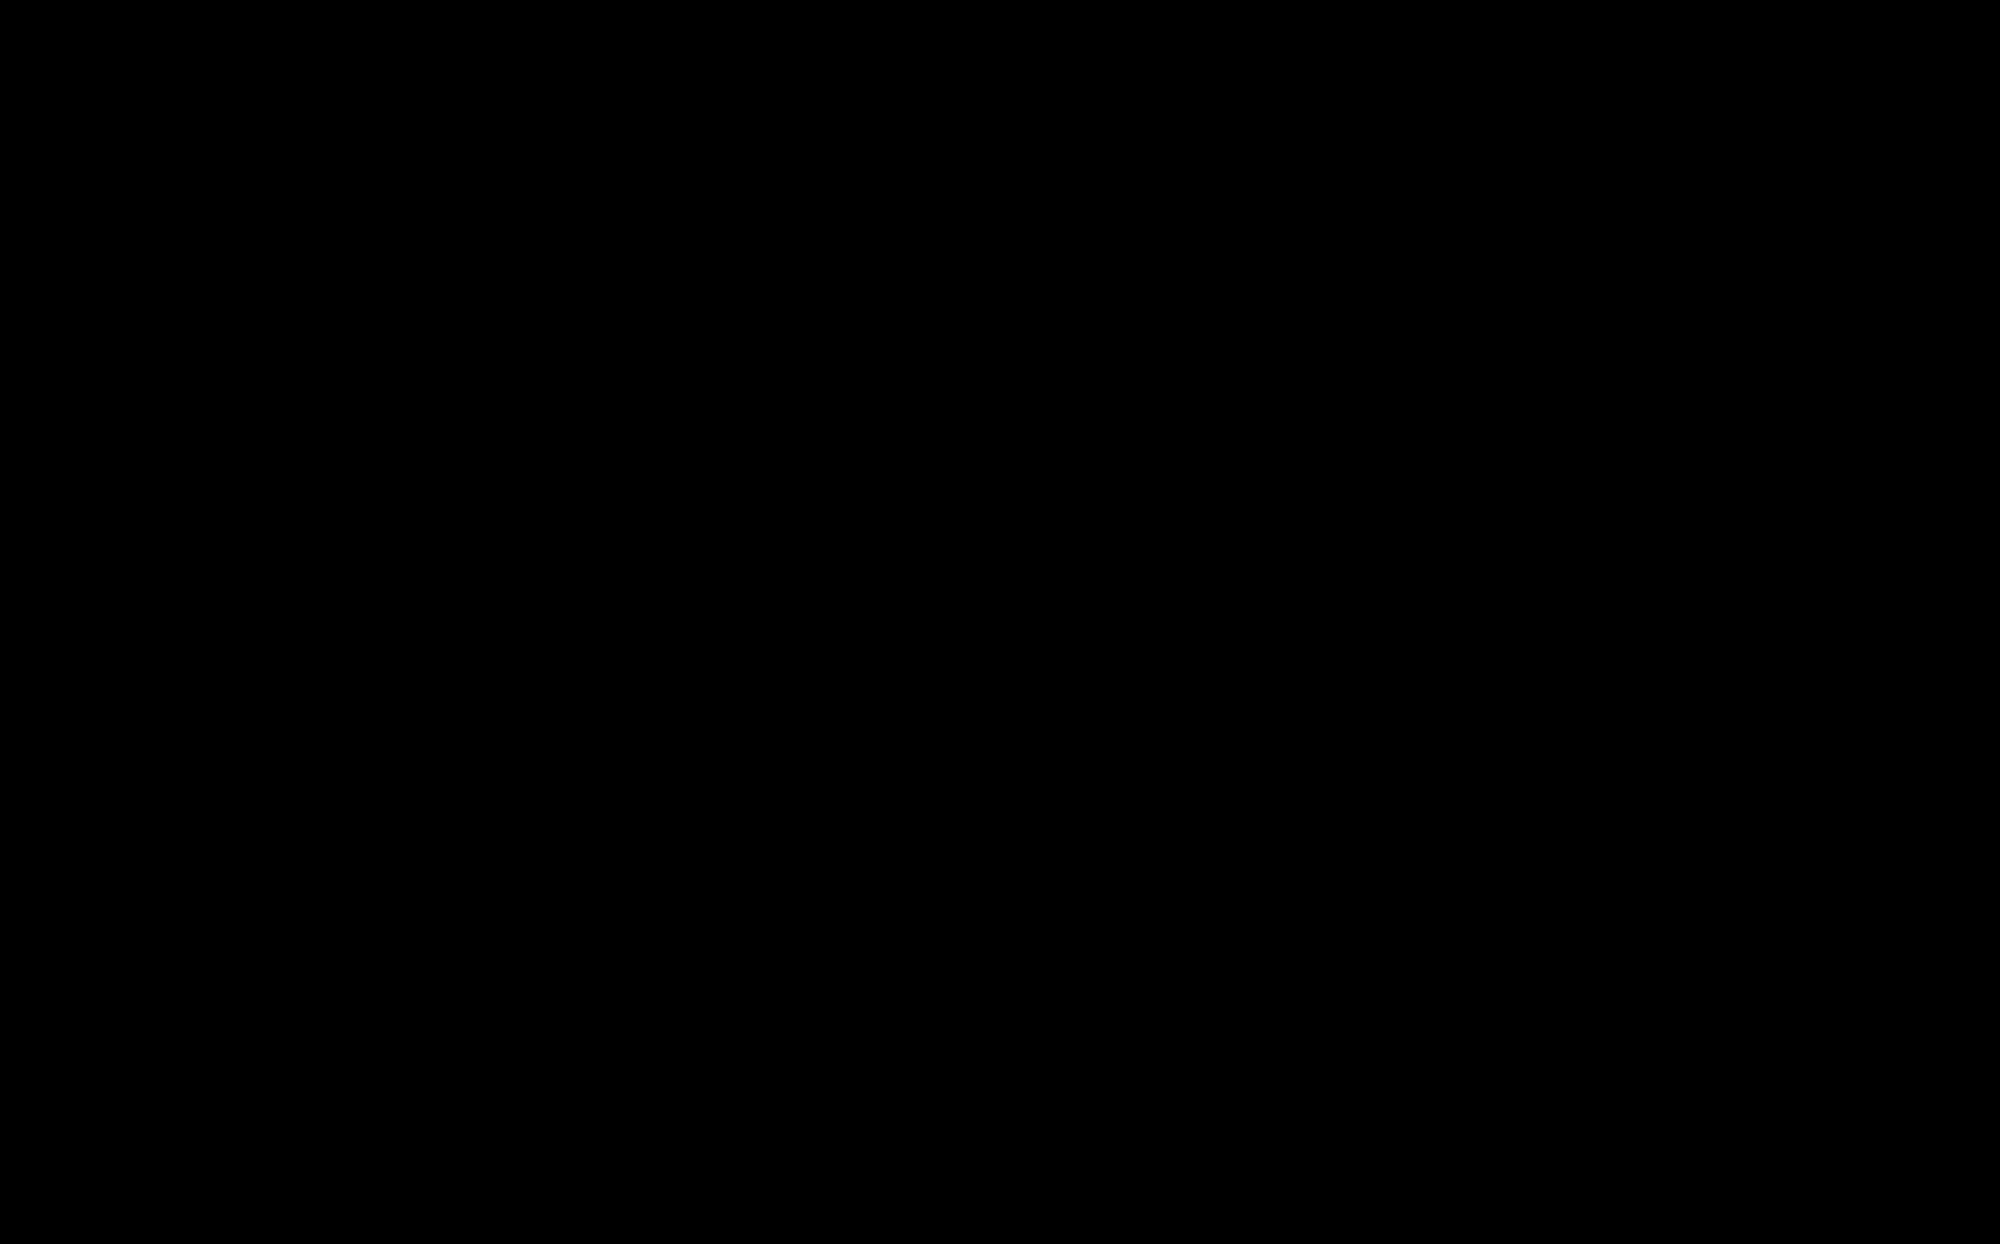 http://upload.wikimedia.org/wikipedia/commons/thumb/5/5f/Hideki_Tojo_signature.svg/2000px-Hideki_Tojo_signature.svg.png